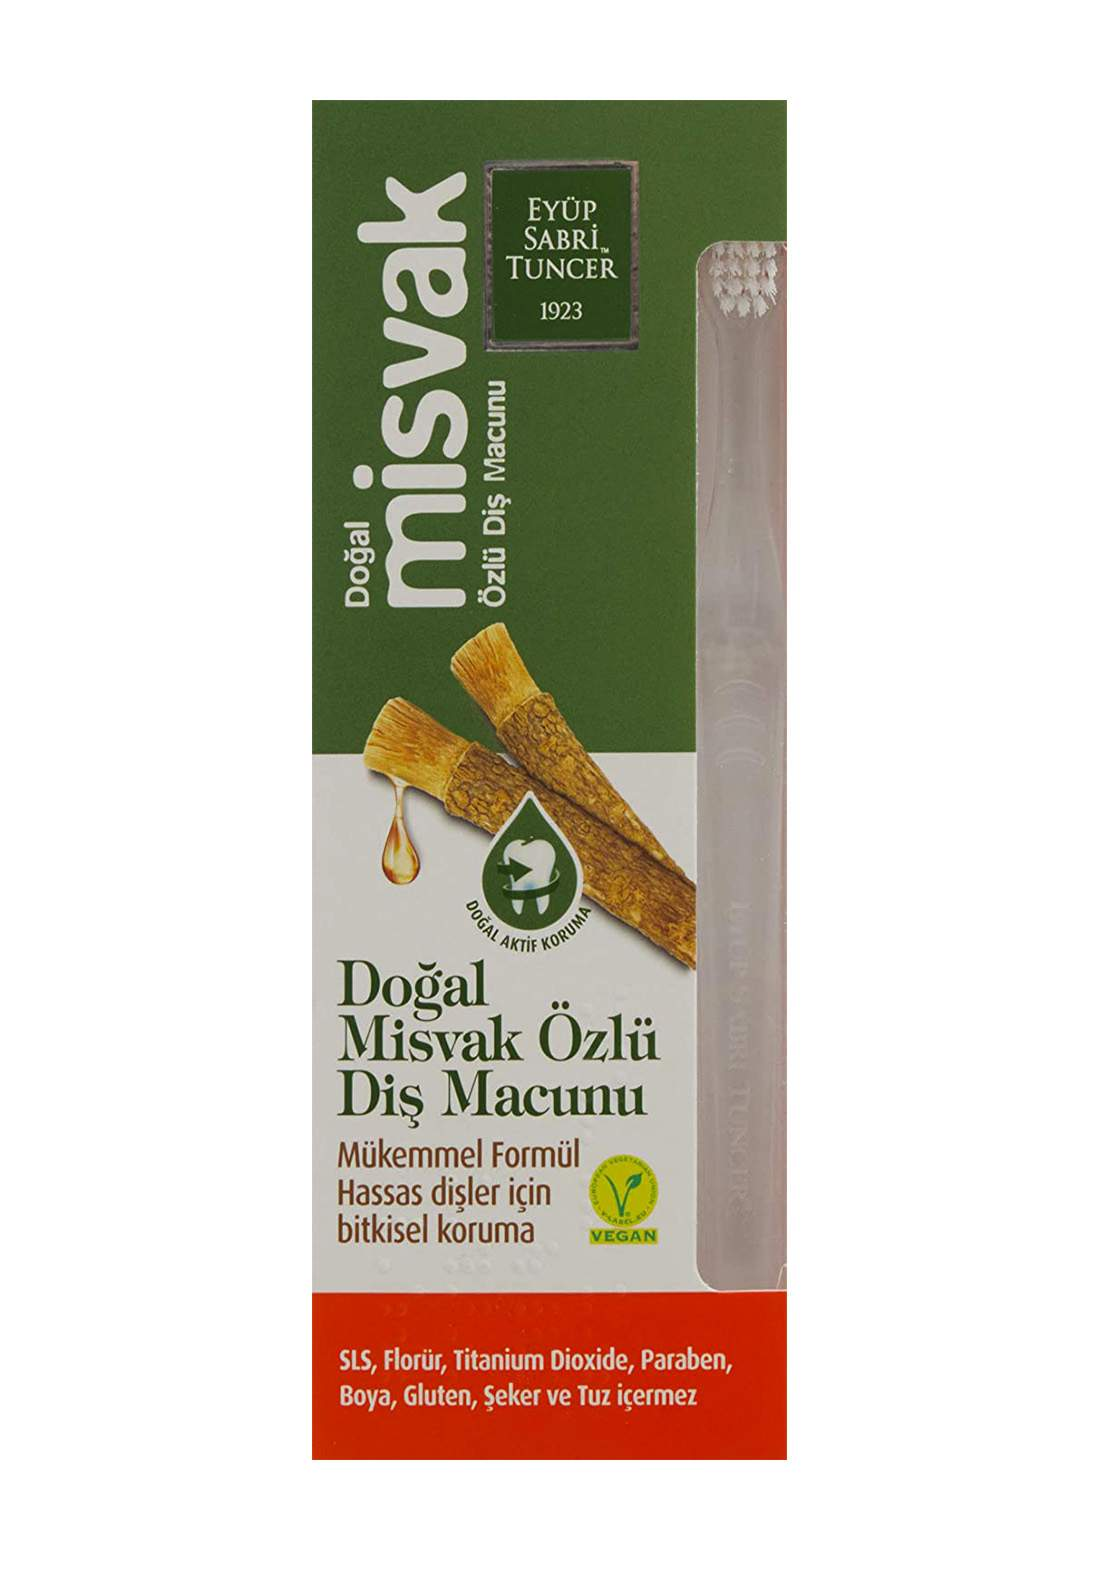 Eyup Sabri Tuncer Natural  Miswak Extract Toothpaste & Toothbrush 75ml معجون أسنان  بالمسواك مع فرشاة